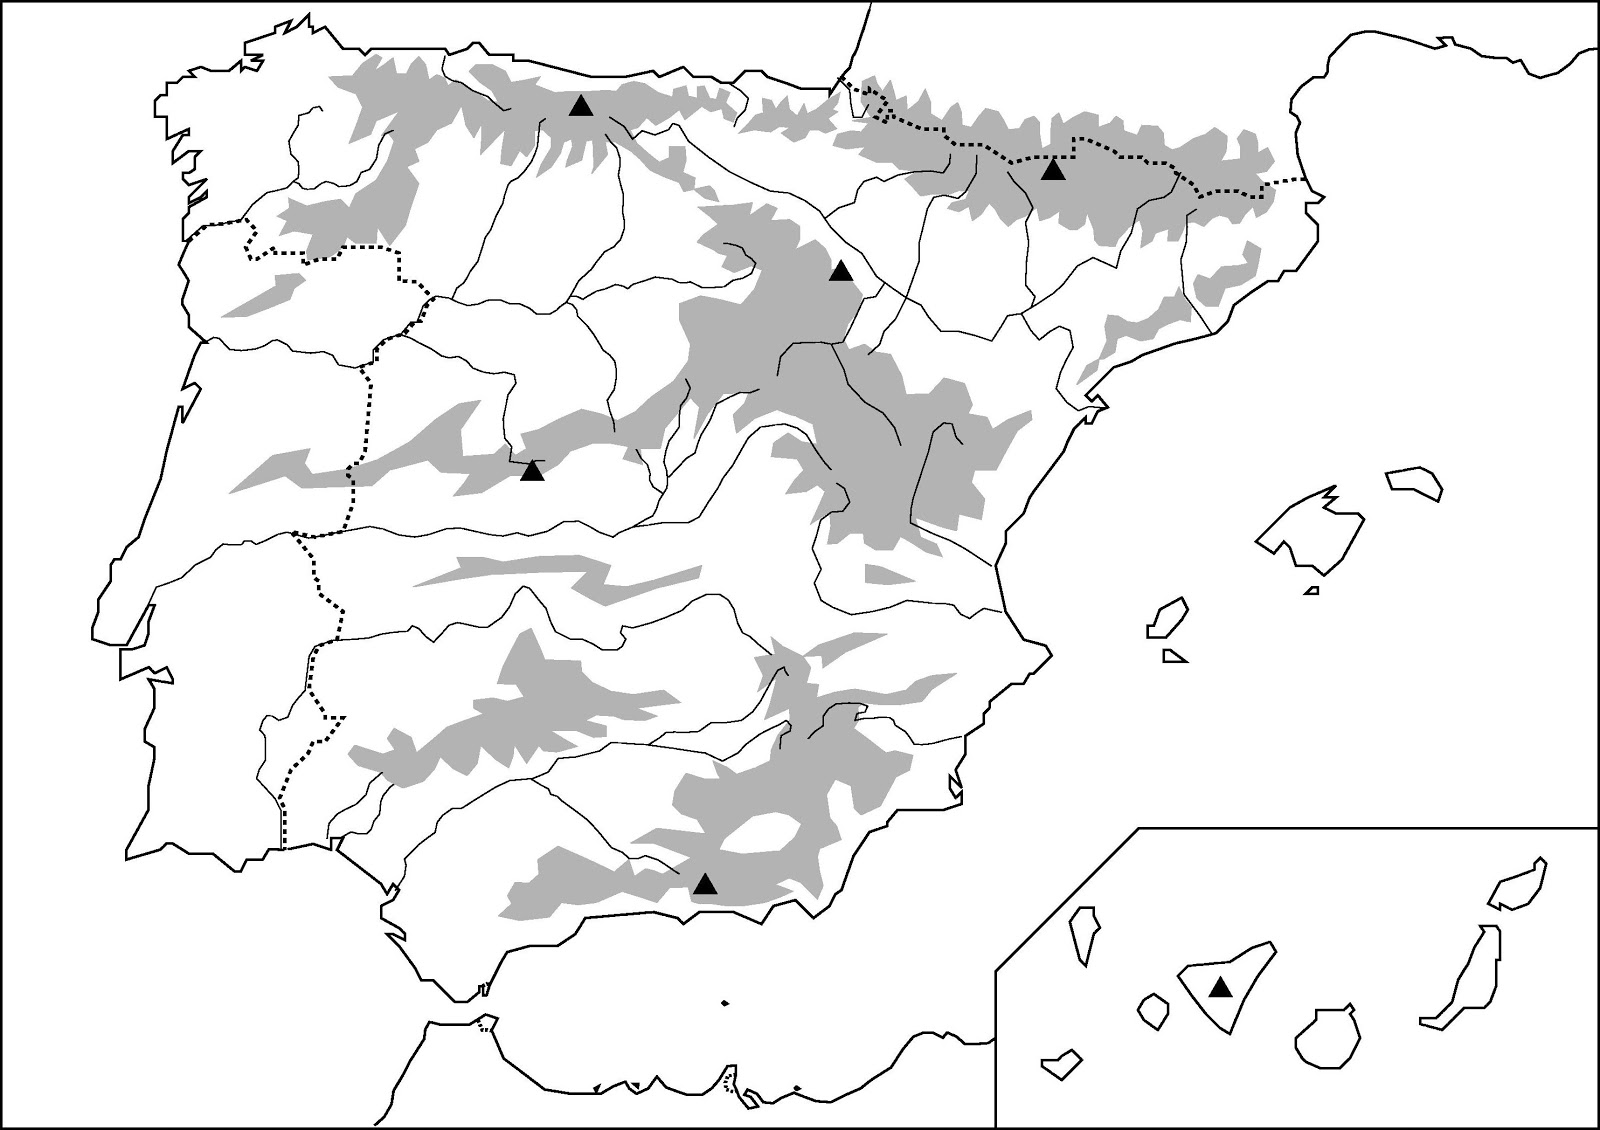 Mapa Mudo Politico De España Para Imprimir Tamaño Folio.Mapas De Espana Para Imprimir Laclasedeptdemontse